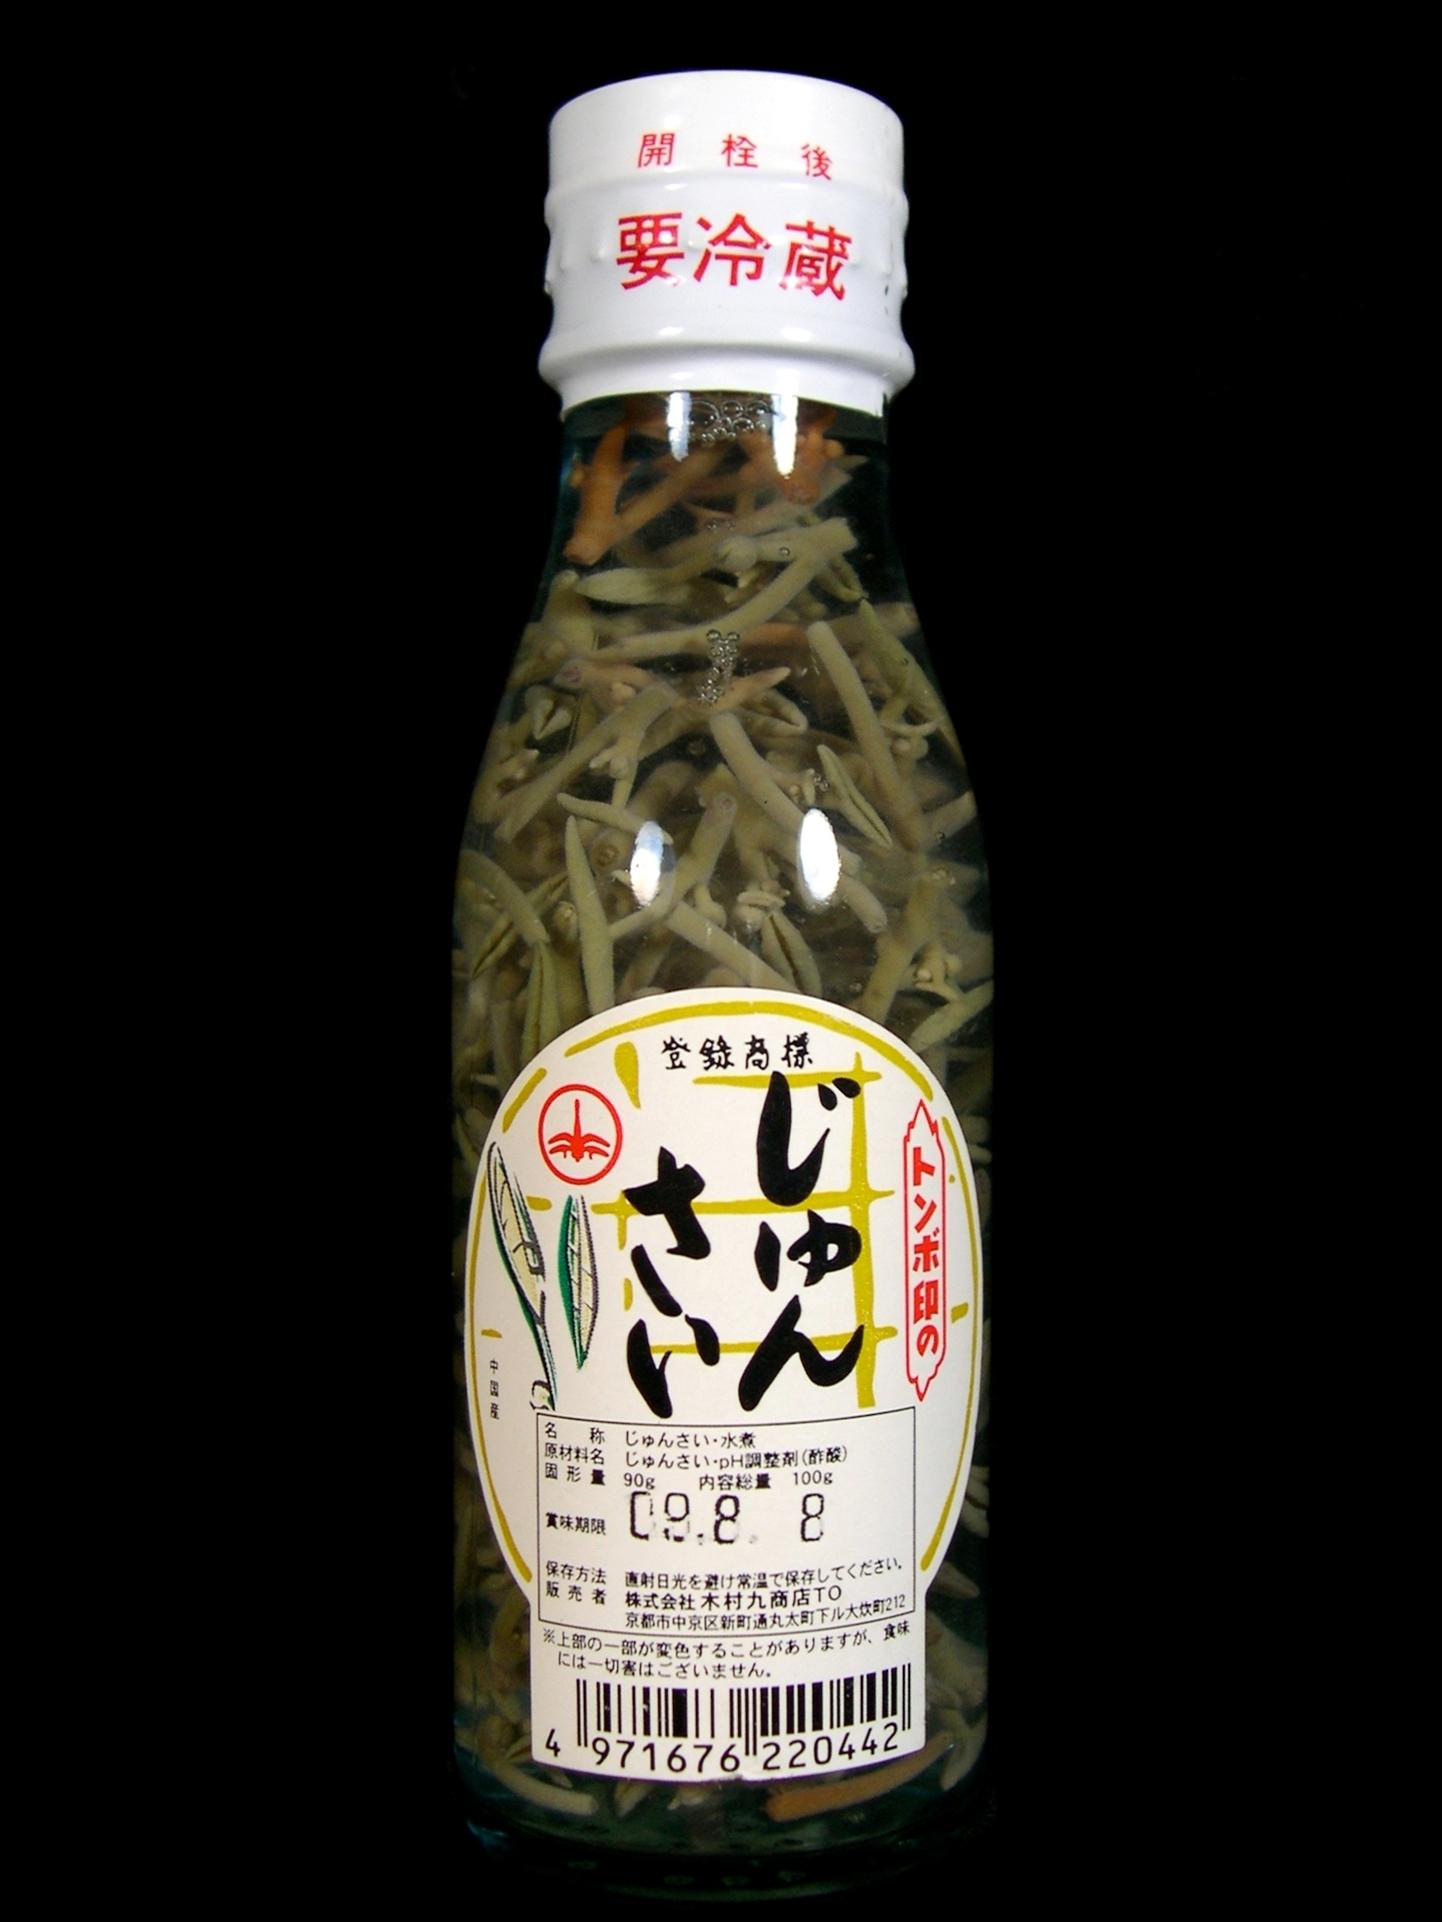 Brasenia schreberi 100g bottle Tombo Jirushi Junsai.jpg